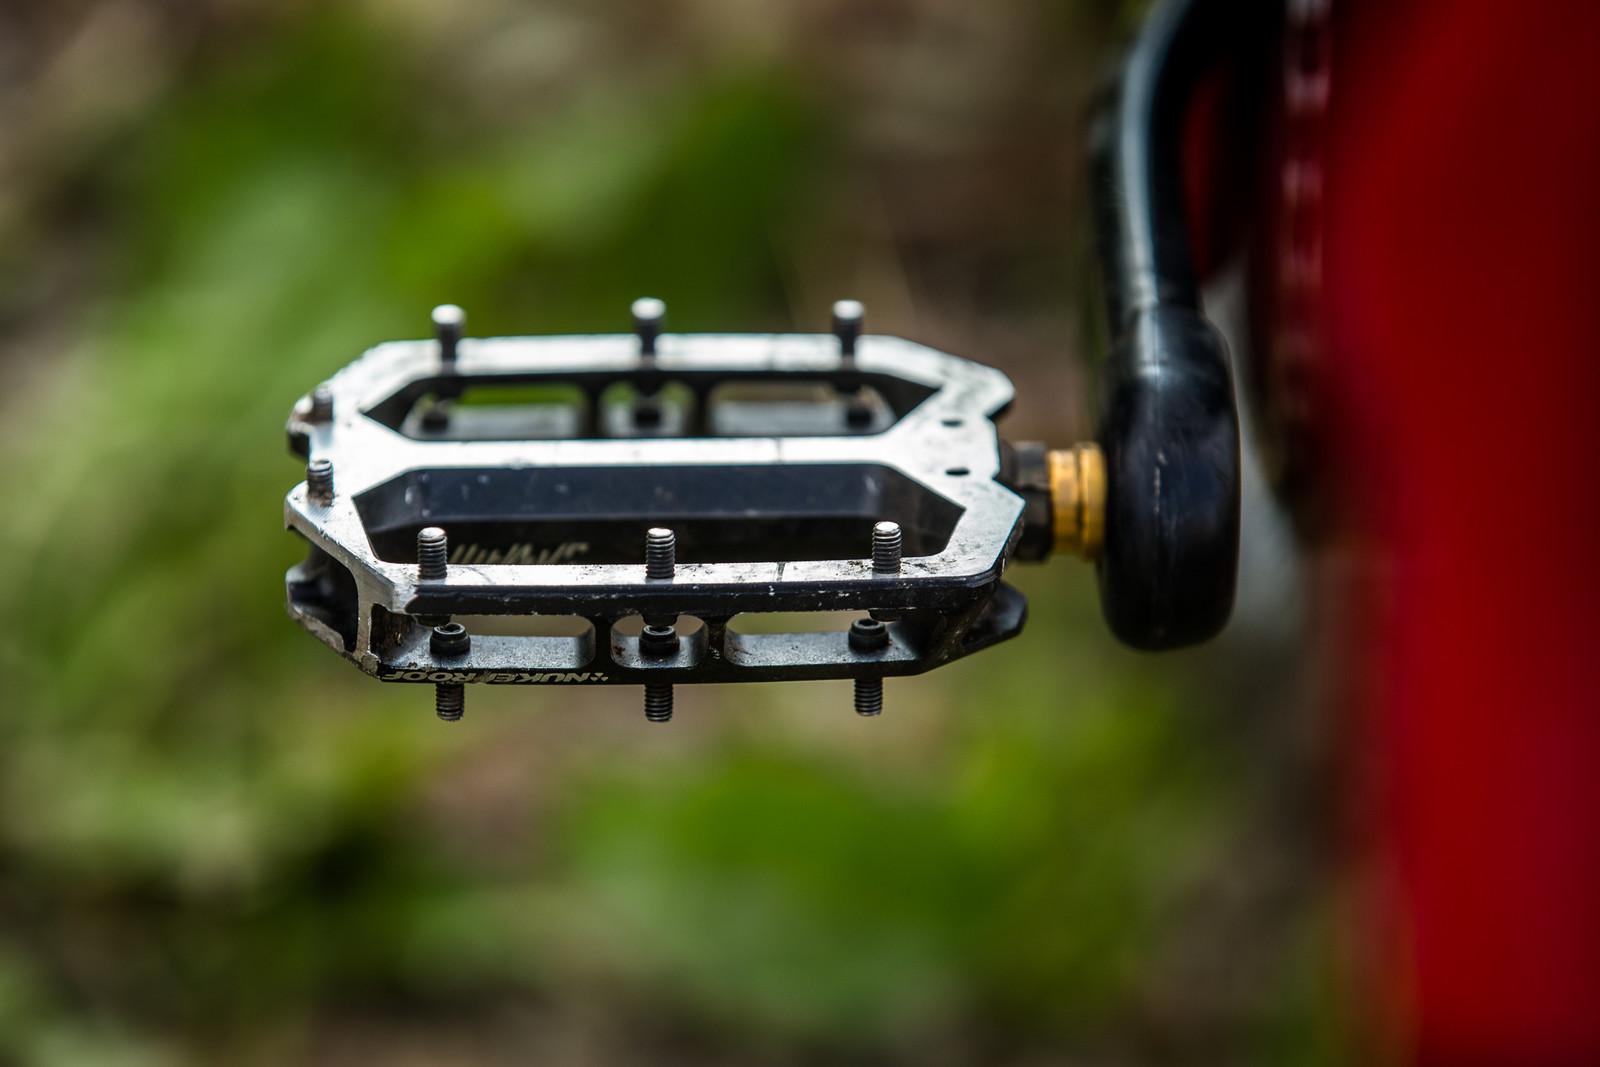 Nasty Pins for the Biggest Wins - WINNING BIKE - Sam Hill's Nukeproof Mega 275 - Mountain Biking Pictures - Vital MTB